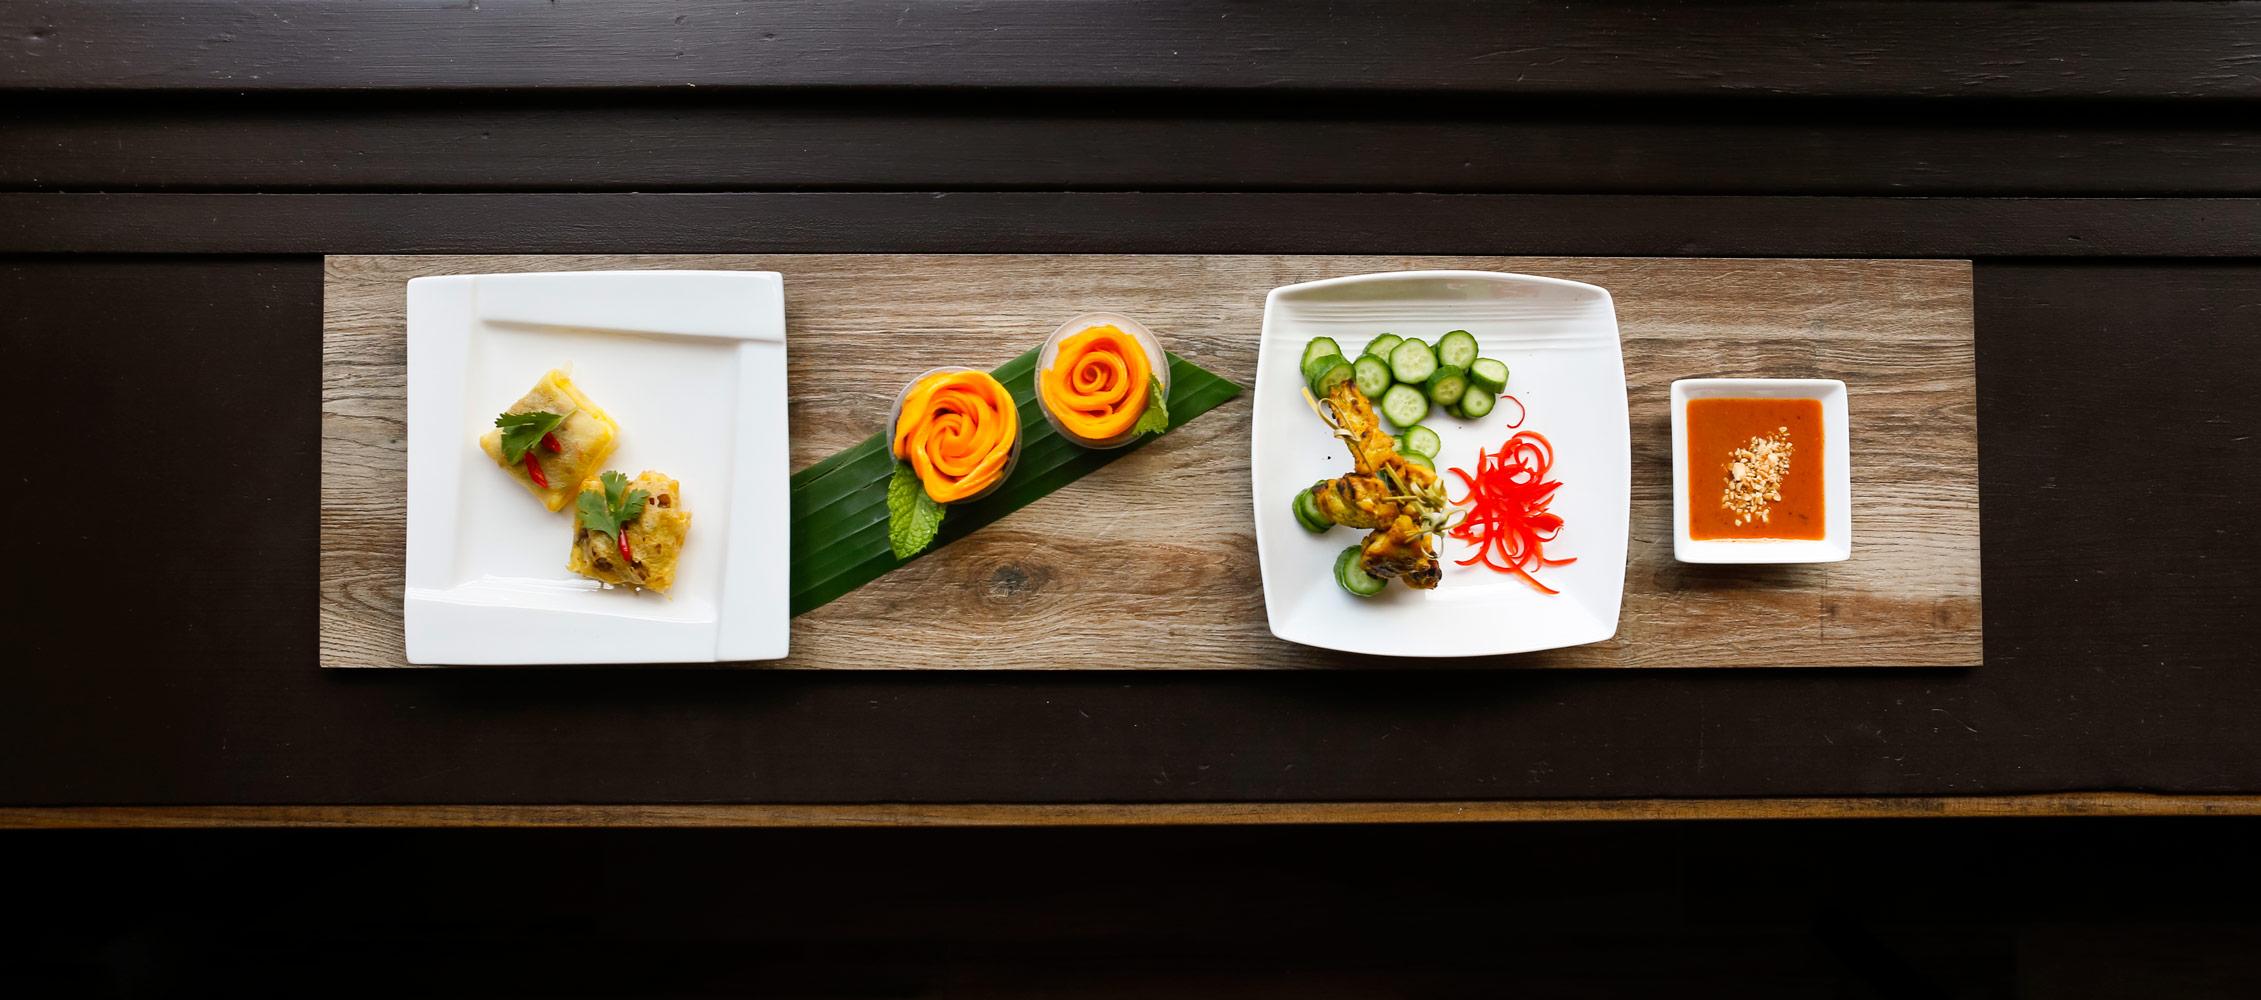 choun's-restaurant-photography-wheaton-geneva-st-charles-batavia-aurora-ruthie-hauge-food-photography-marketing.jpg